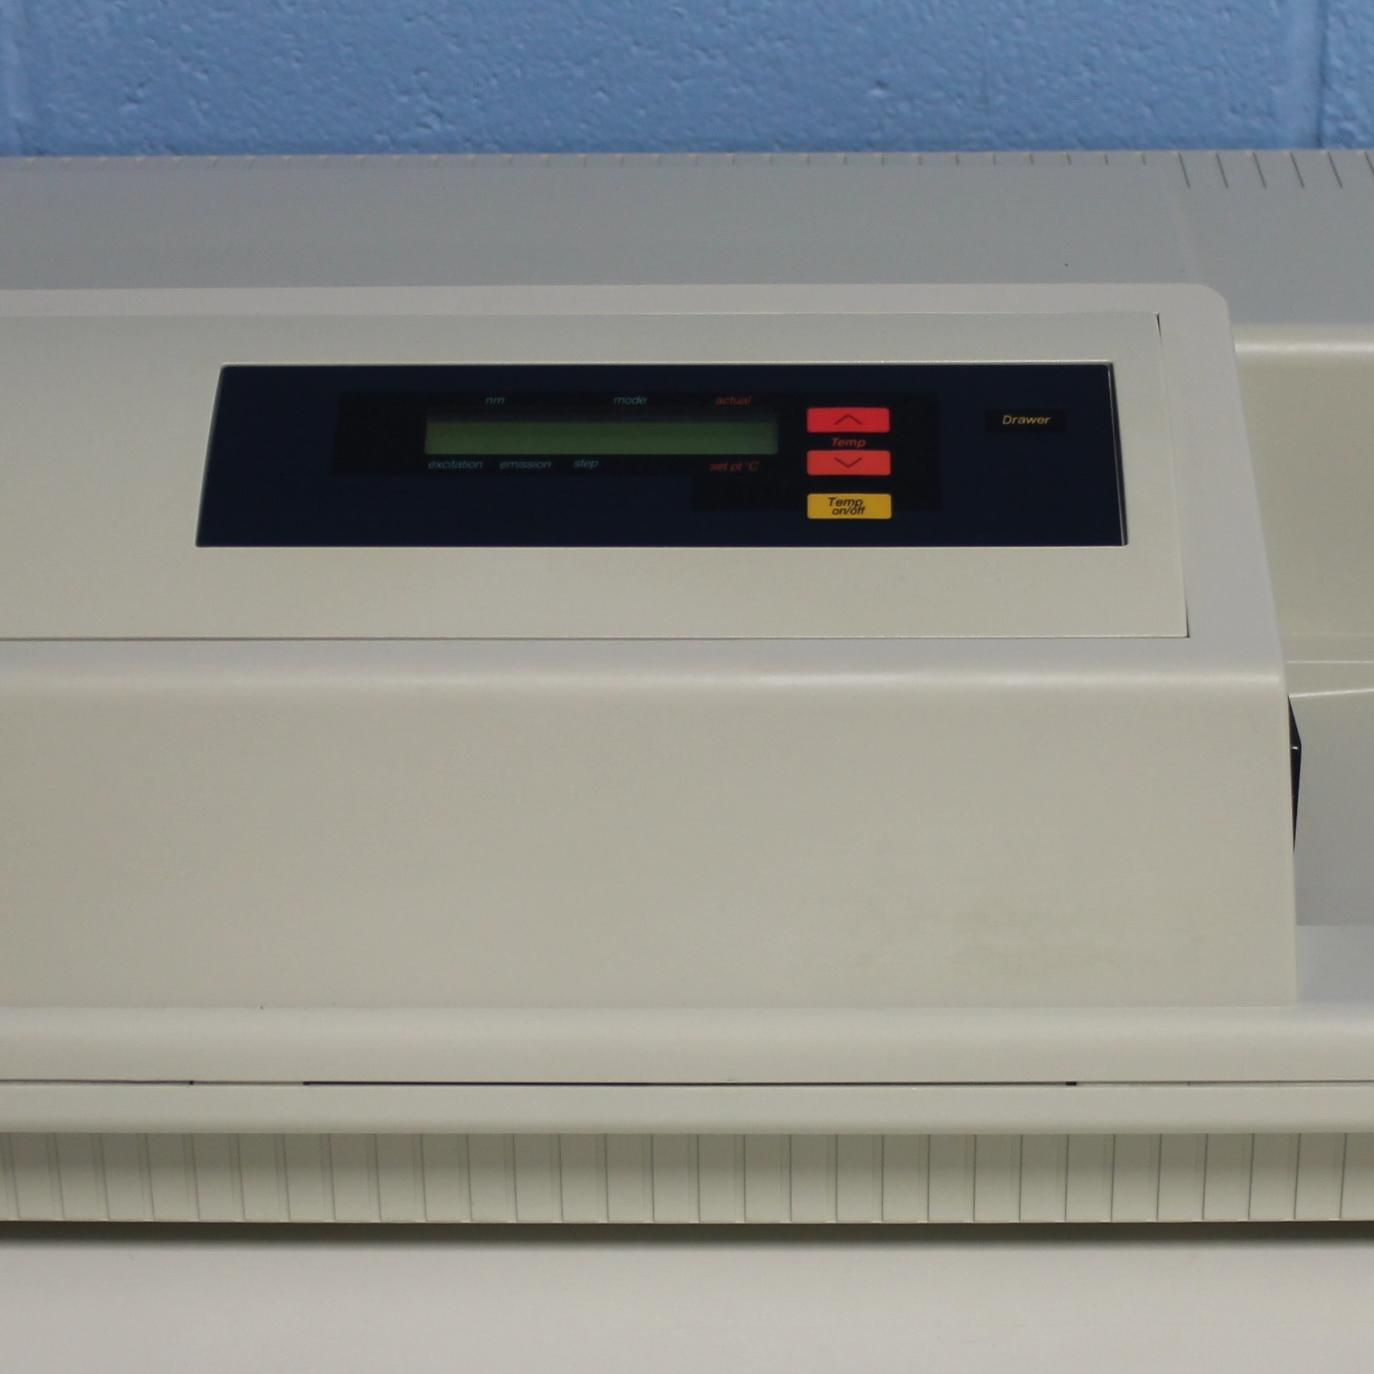 SpectraMAX Gemini EM Fluorescence Microplate Reader